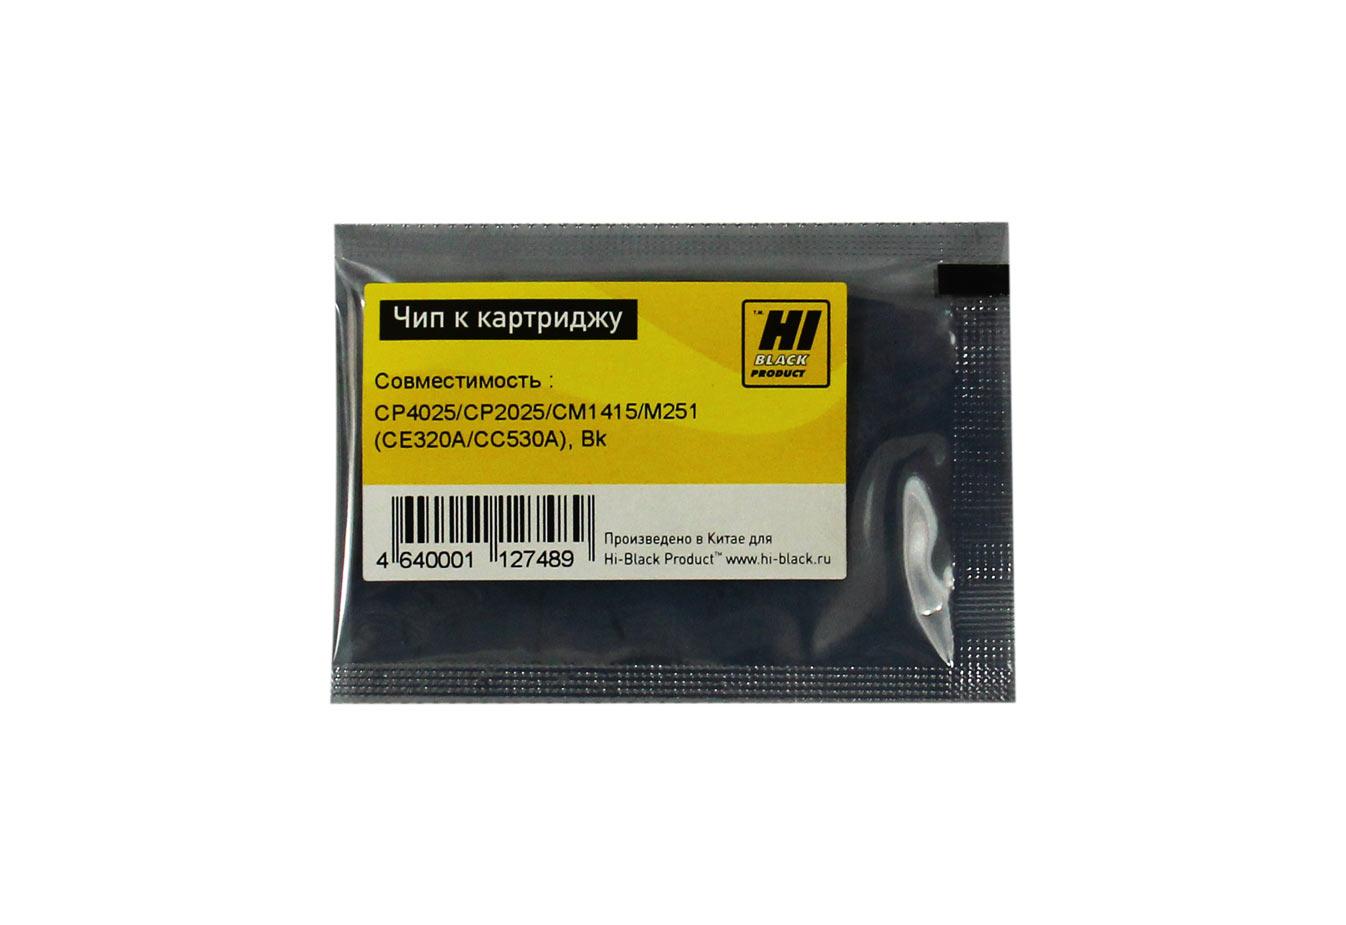 Чип Hi-Black к картриджу HP CLJ CP4025/CP2025/CM1415/M251 (CE320A/CC530A), Bk